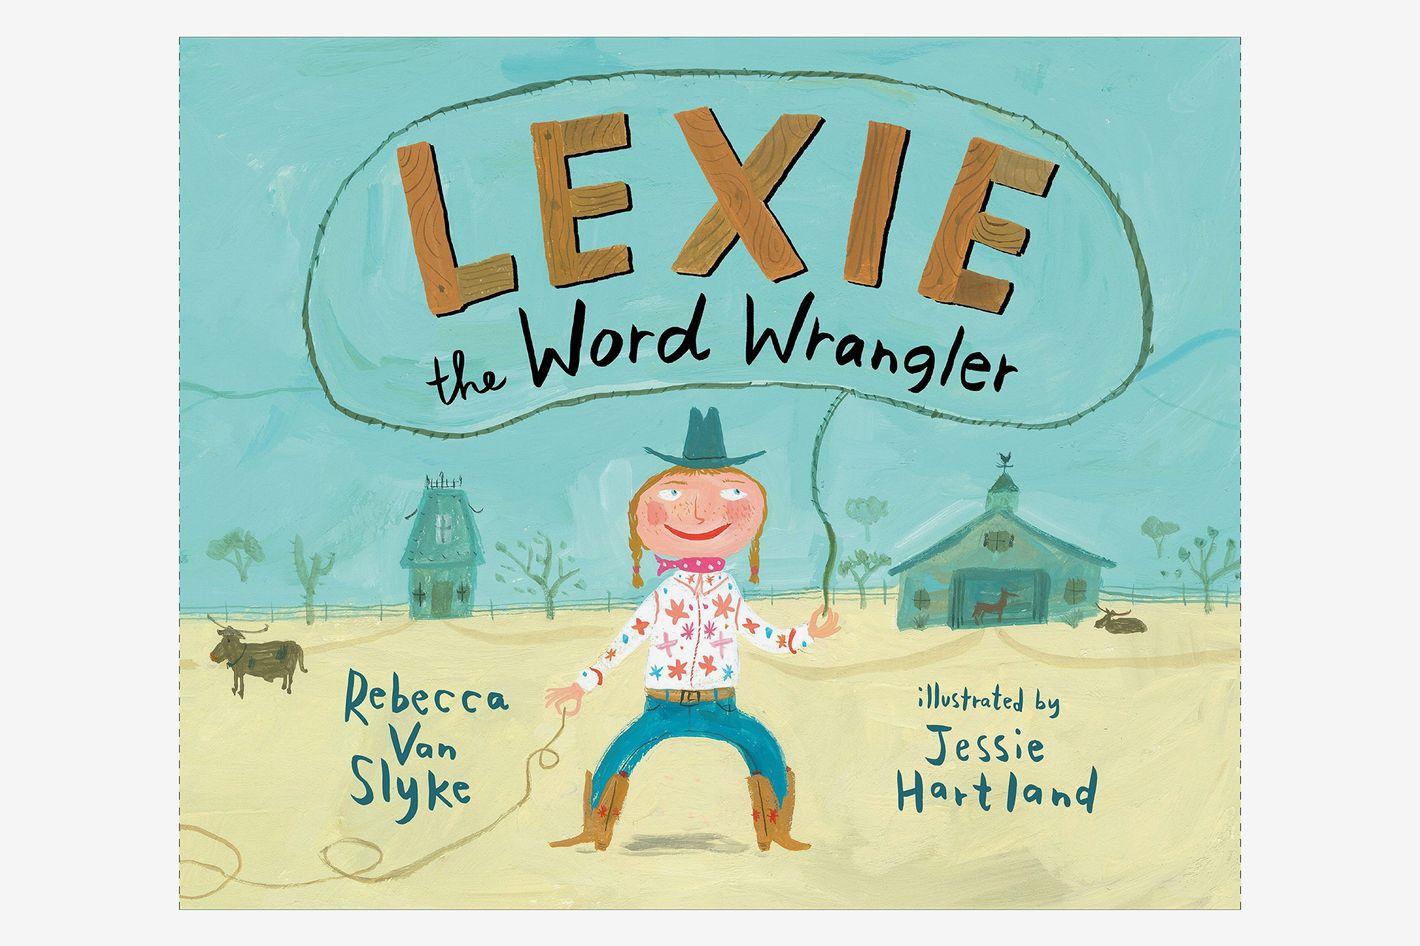 """Lexie the Word Wrangler,"" by Rebecca Van Slyke"